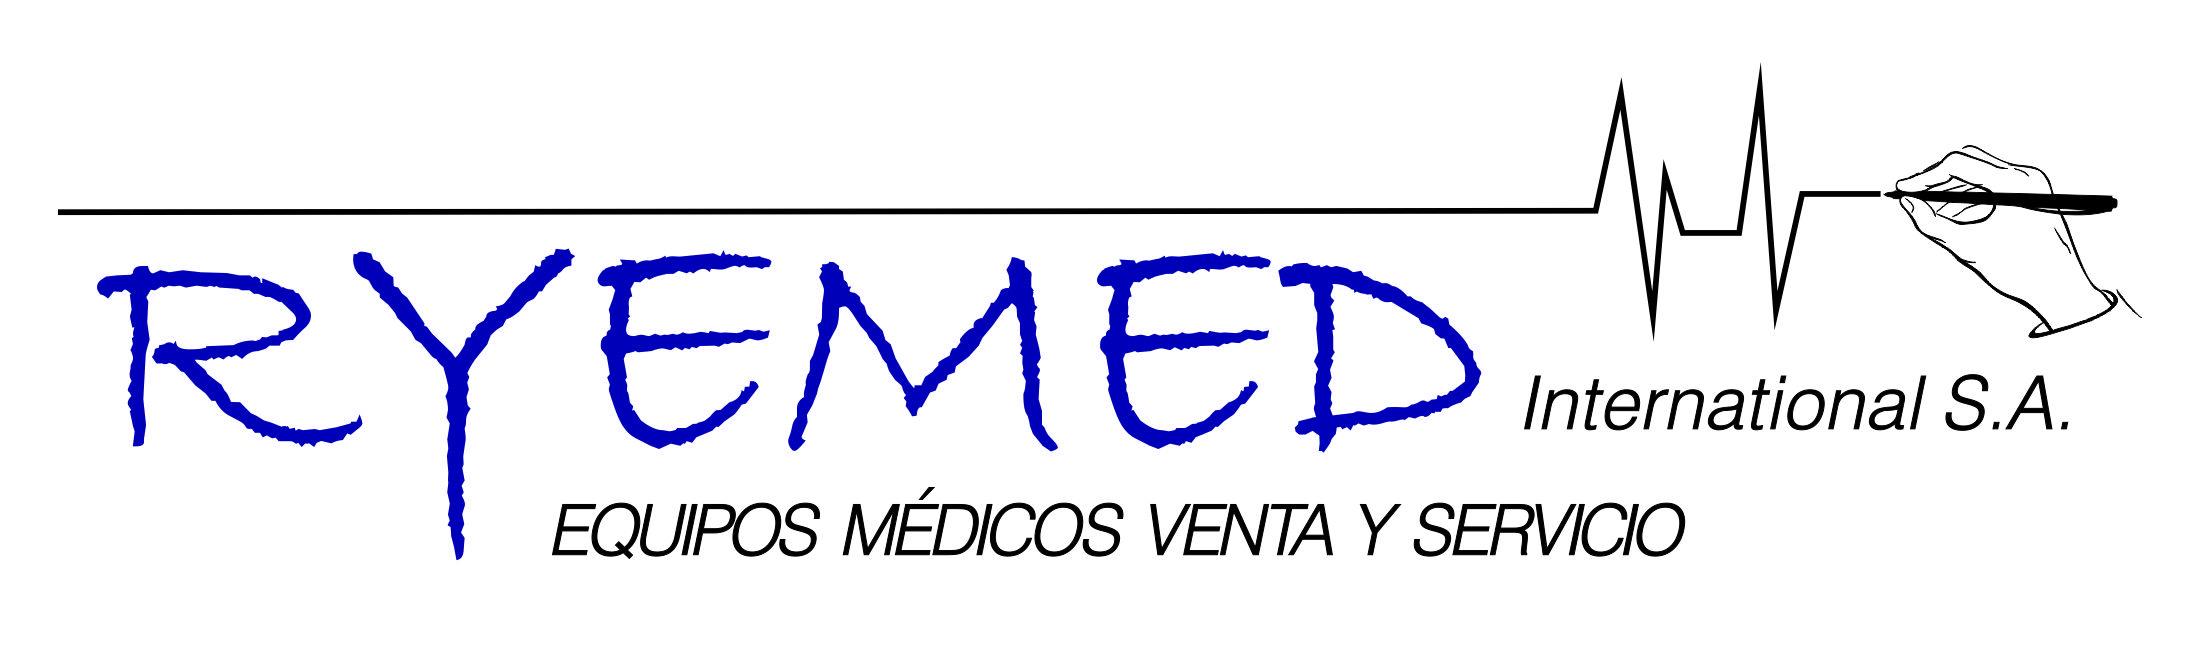 Ryemed